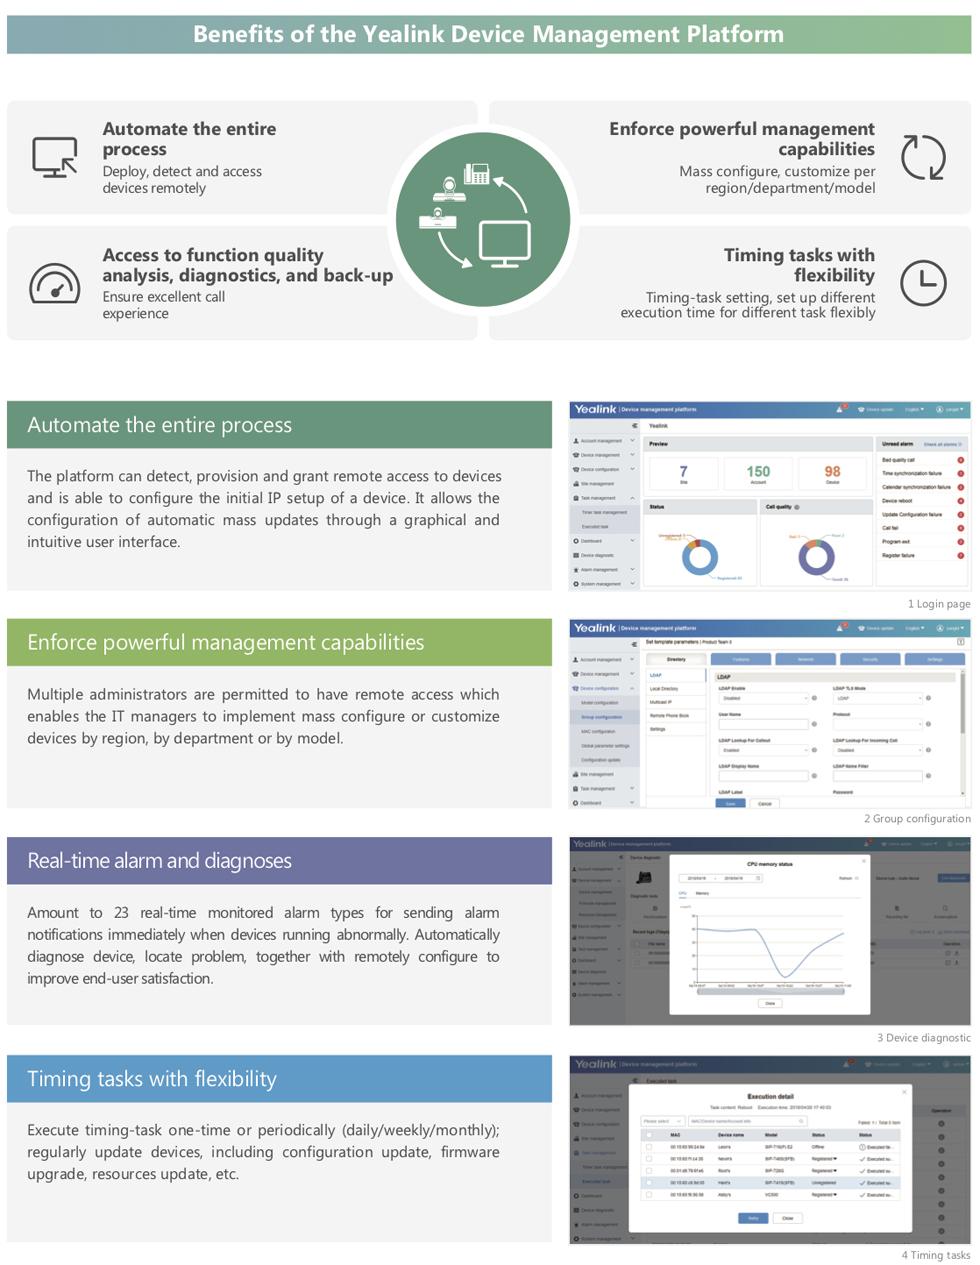 Yealink Device Management Platform_Device Management